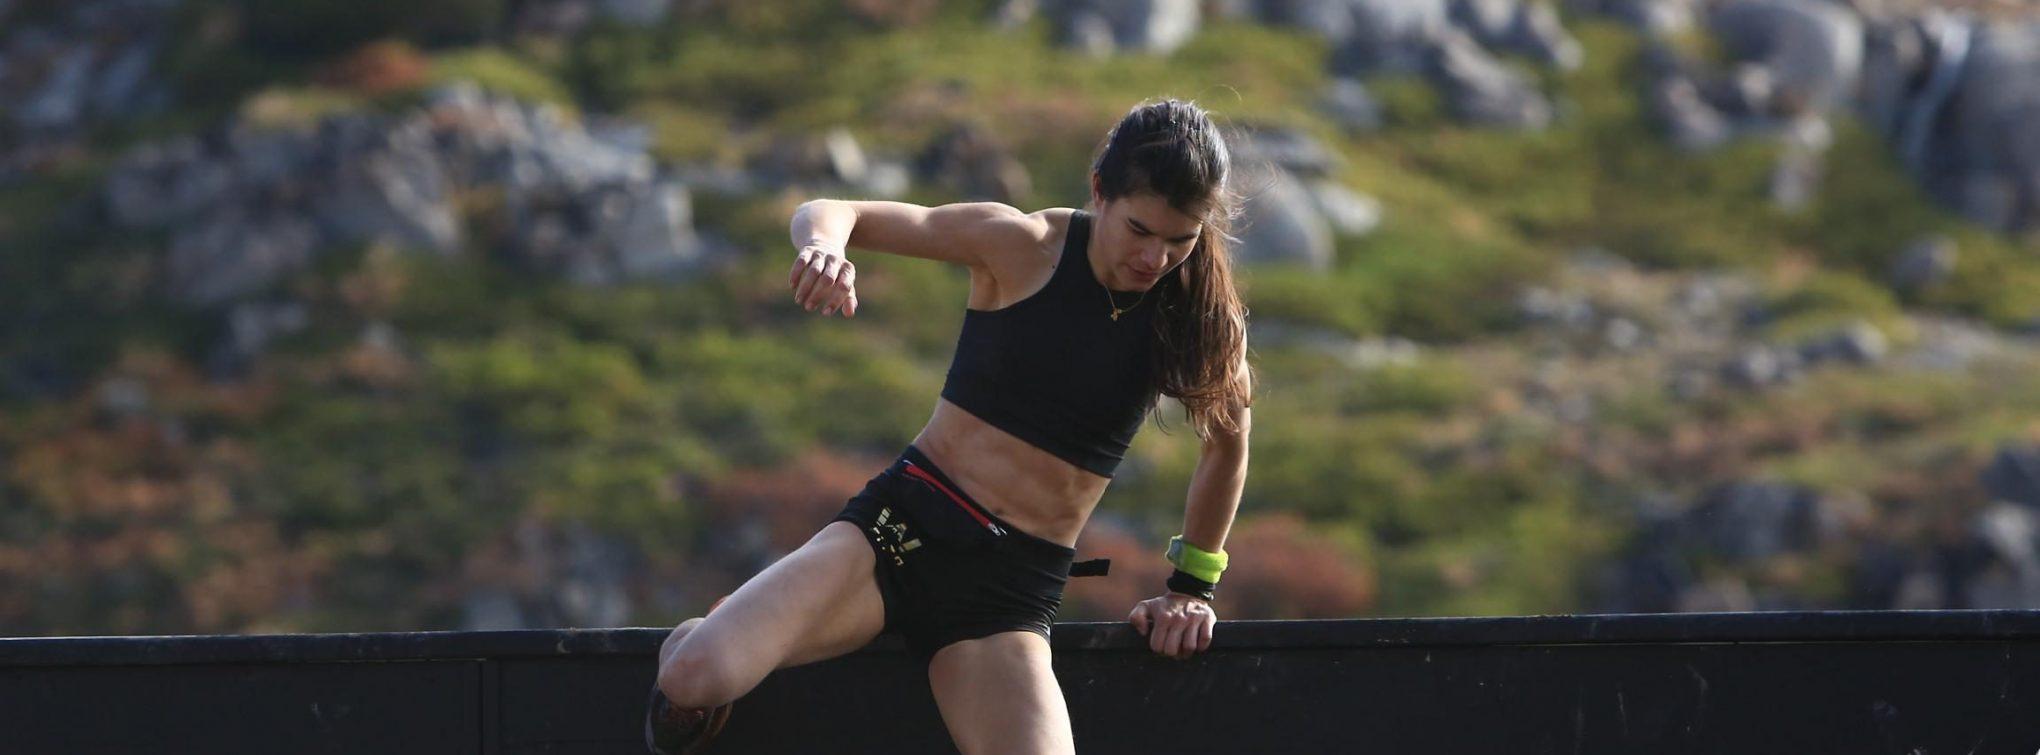 rebeccahammond